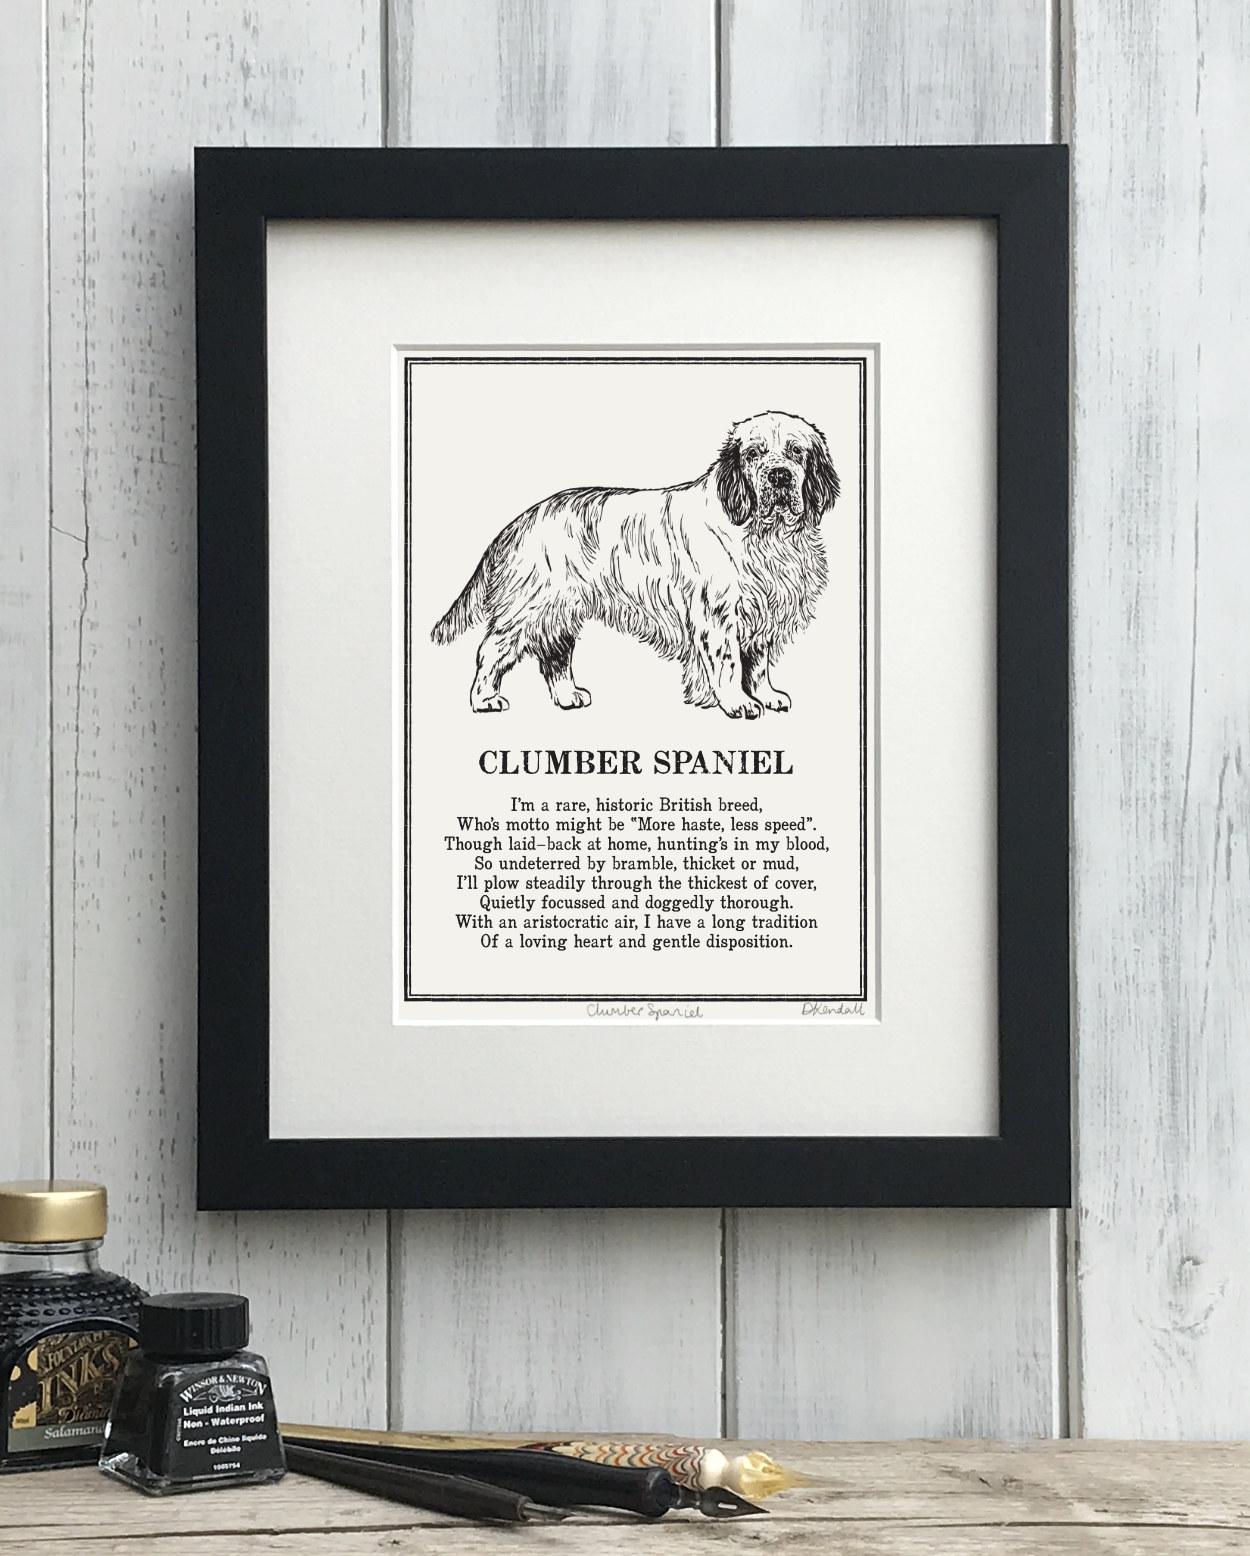 Clumber Spaniel Doggerel Illustrated Poem Art Print | The Enlightened Hound